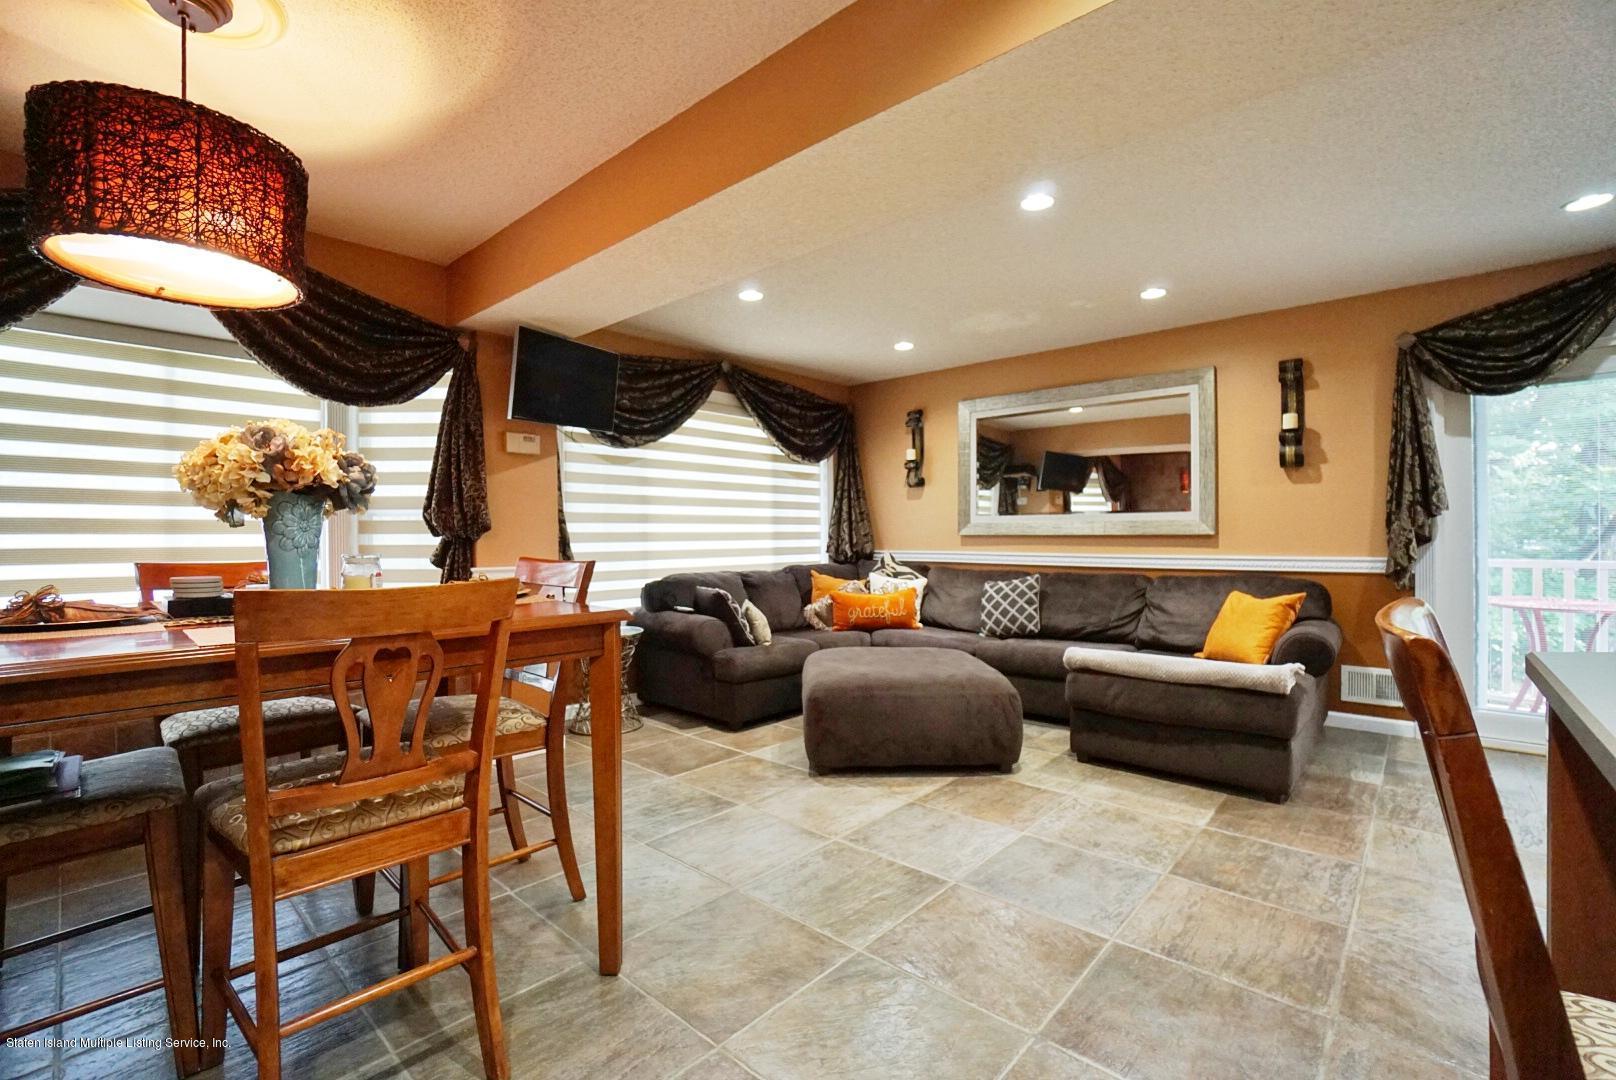 Single Family - Attached 30 Halpin Avenue  Staten Island, NY 10312, MLS-1132039-16